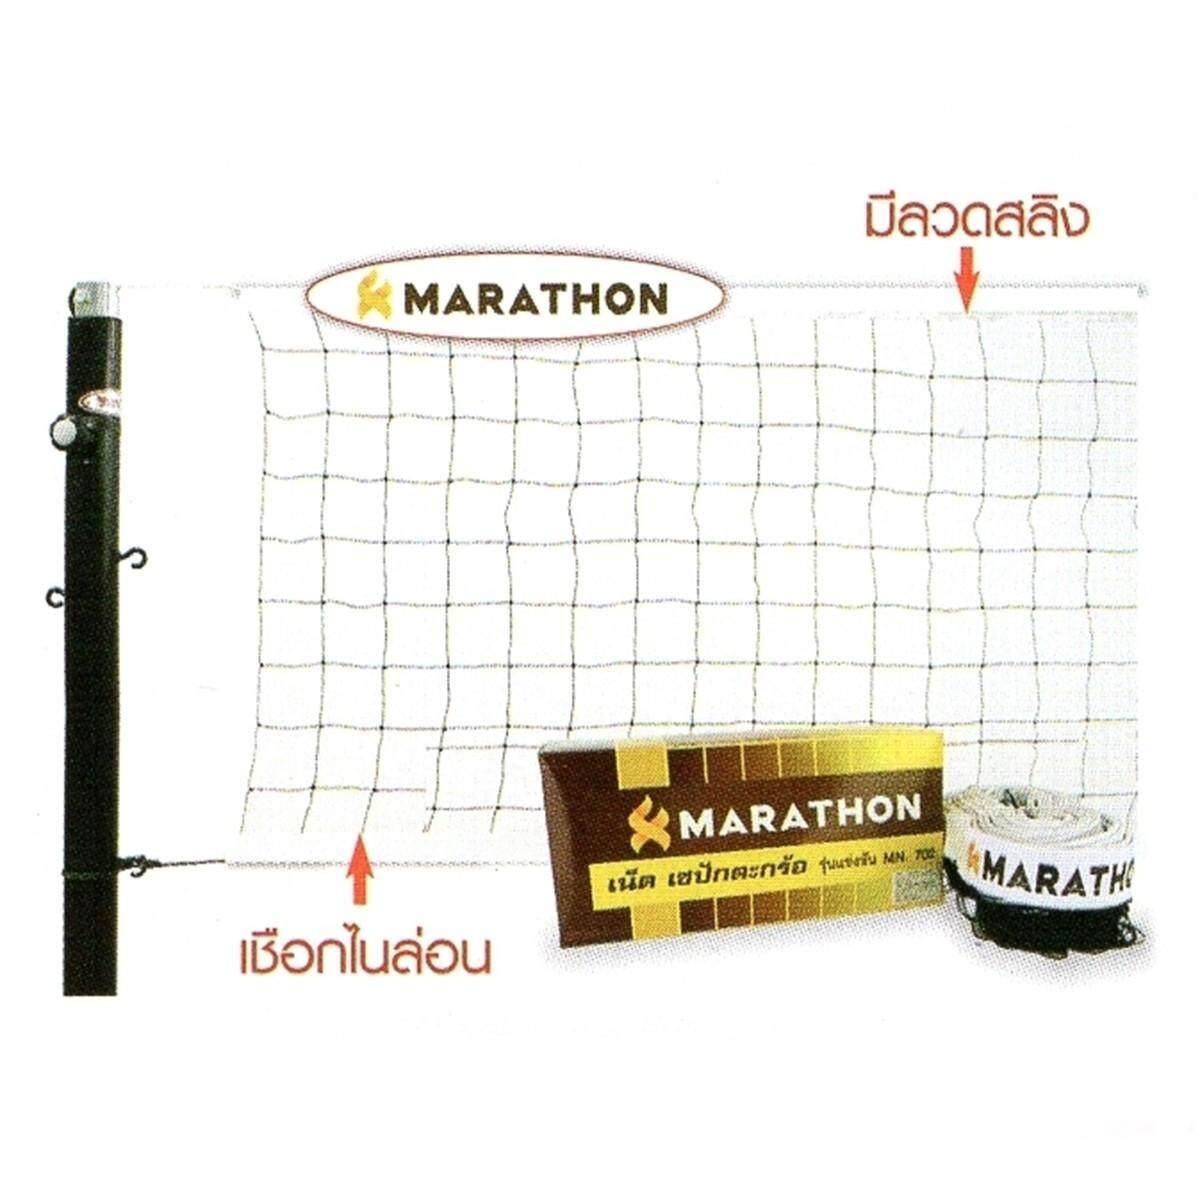 Marathon ตาข่ายตะกร้อ ไนล่อนสลิง รุ่น Mt-702 By Gadget Heroes.